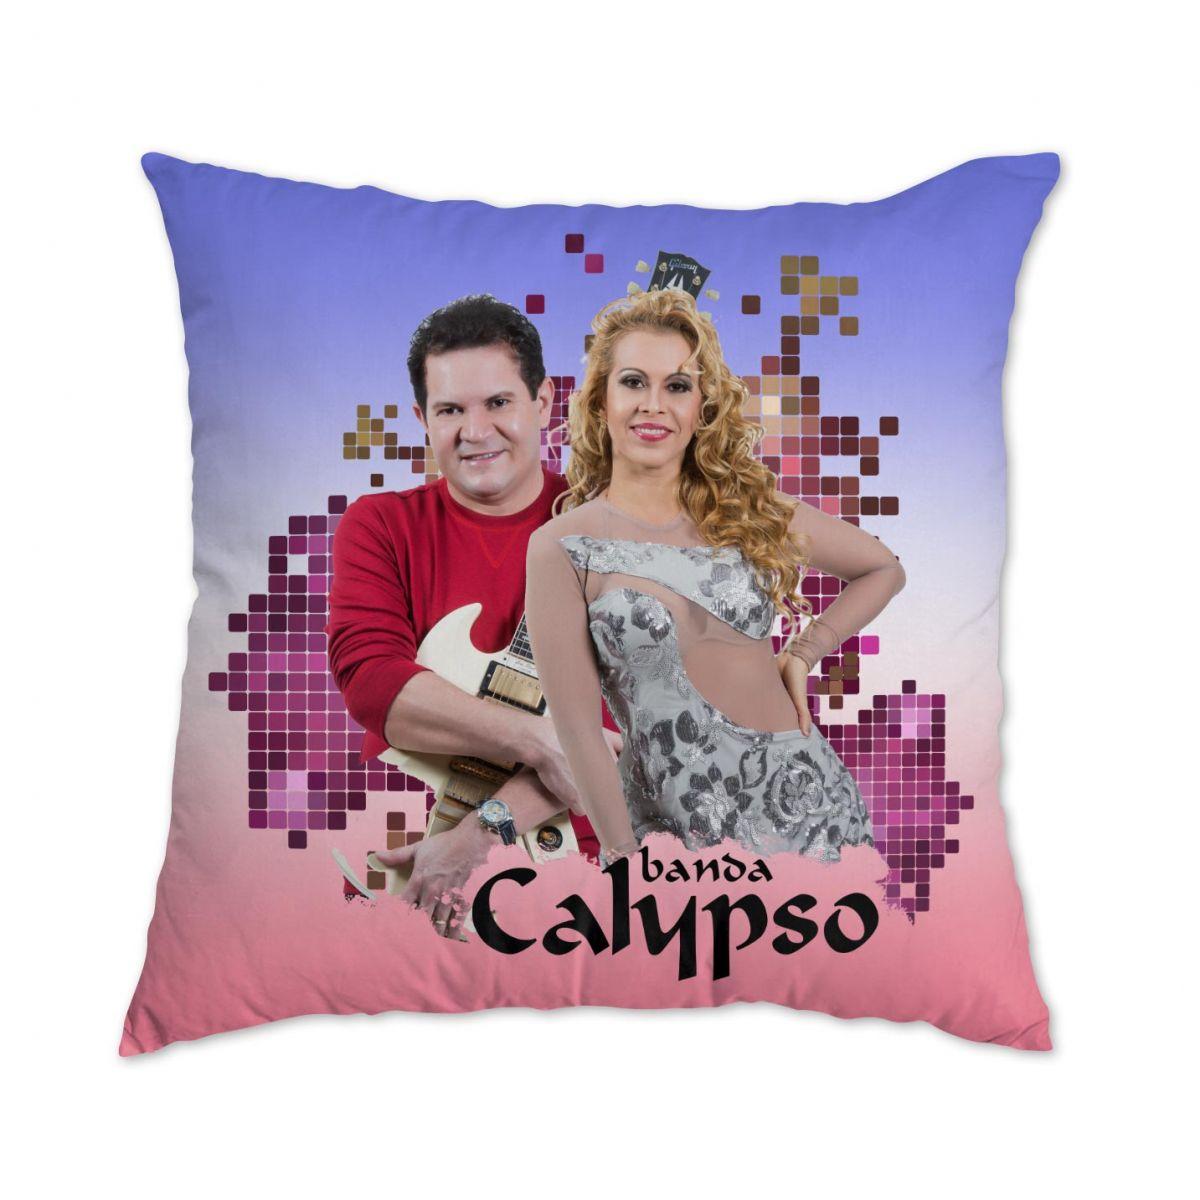 Almofada Calypso Estrela do Meu Show